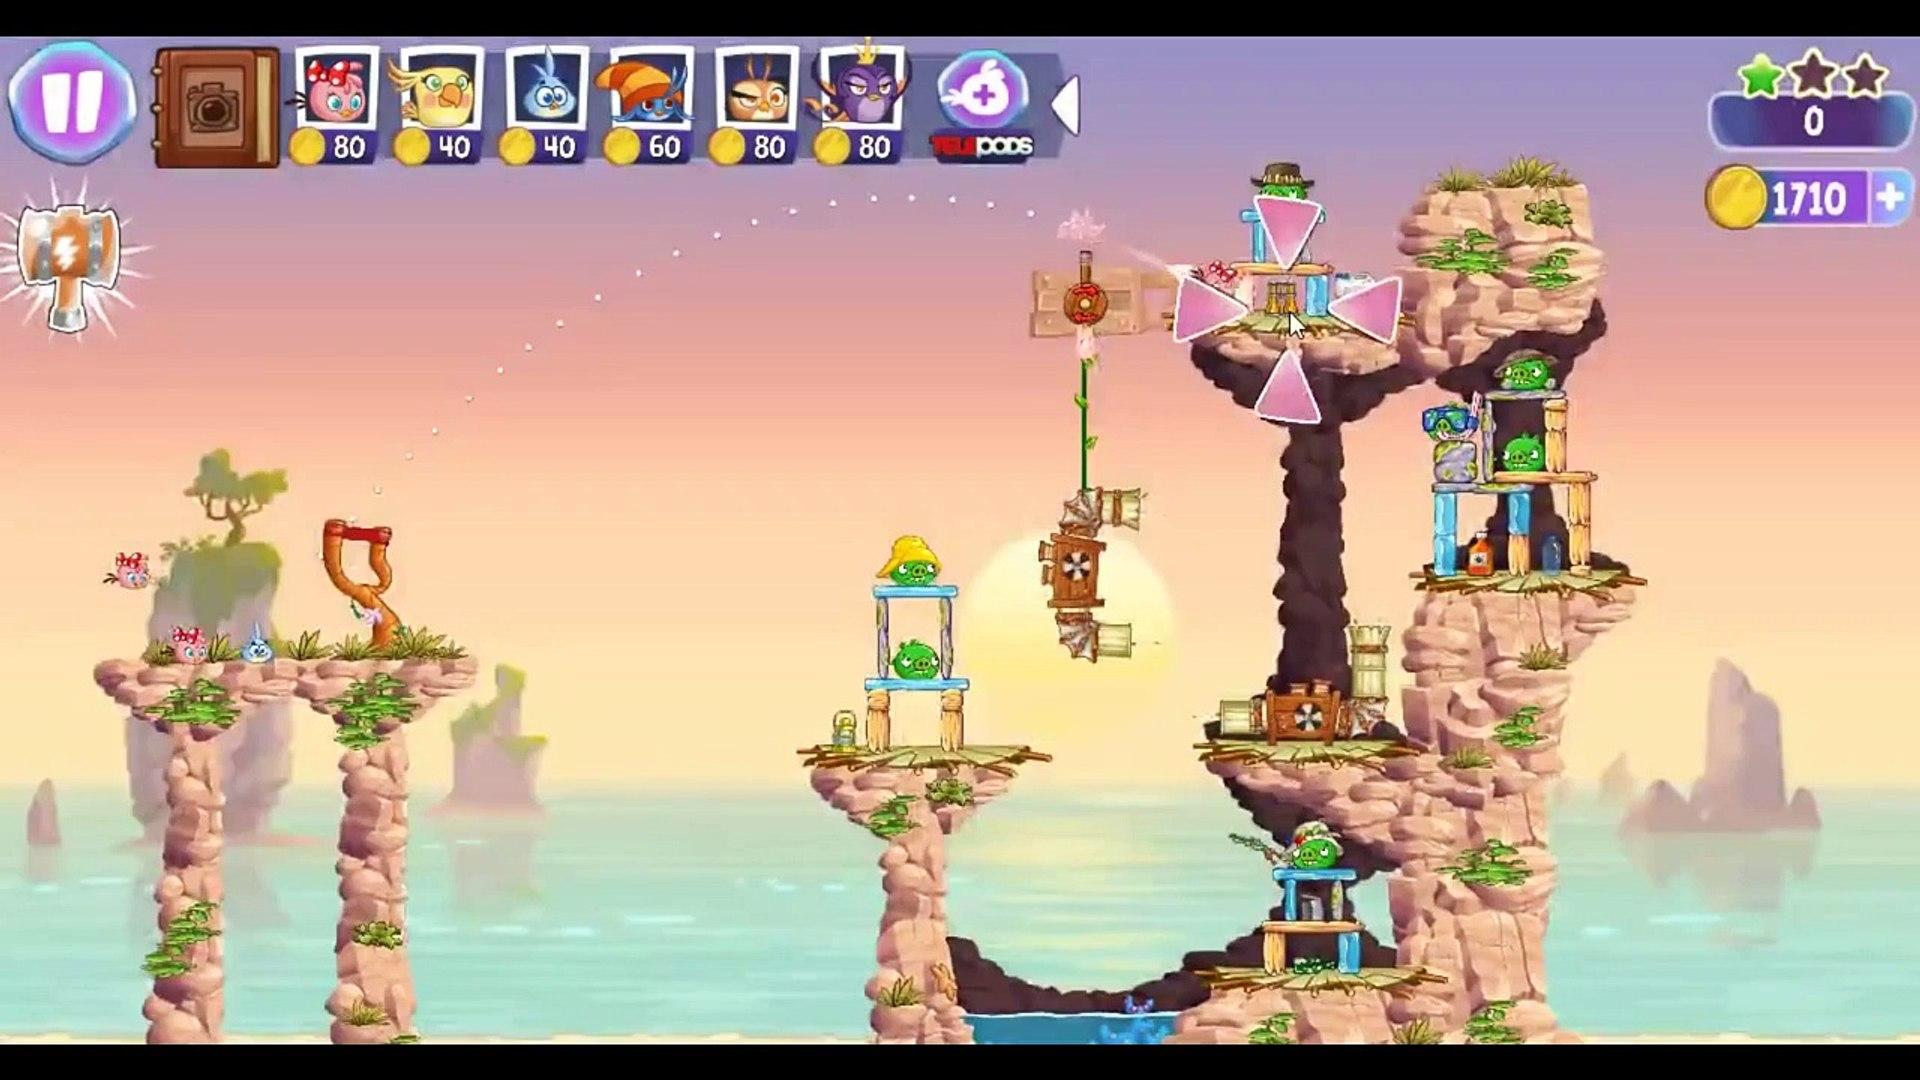 Angry Birds Stella Level 58 Episode 2 Walkthrough ★★★ Beach Day